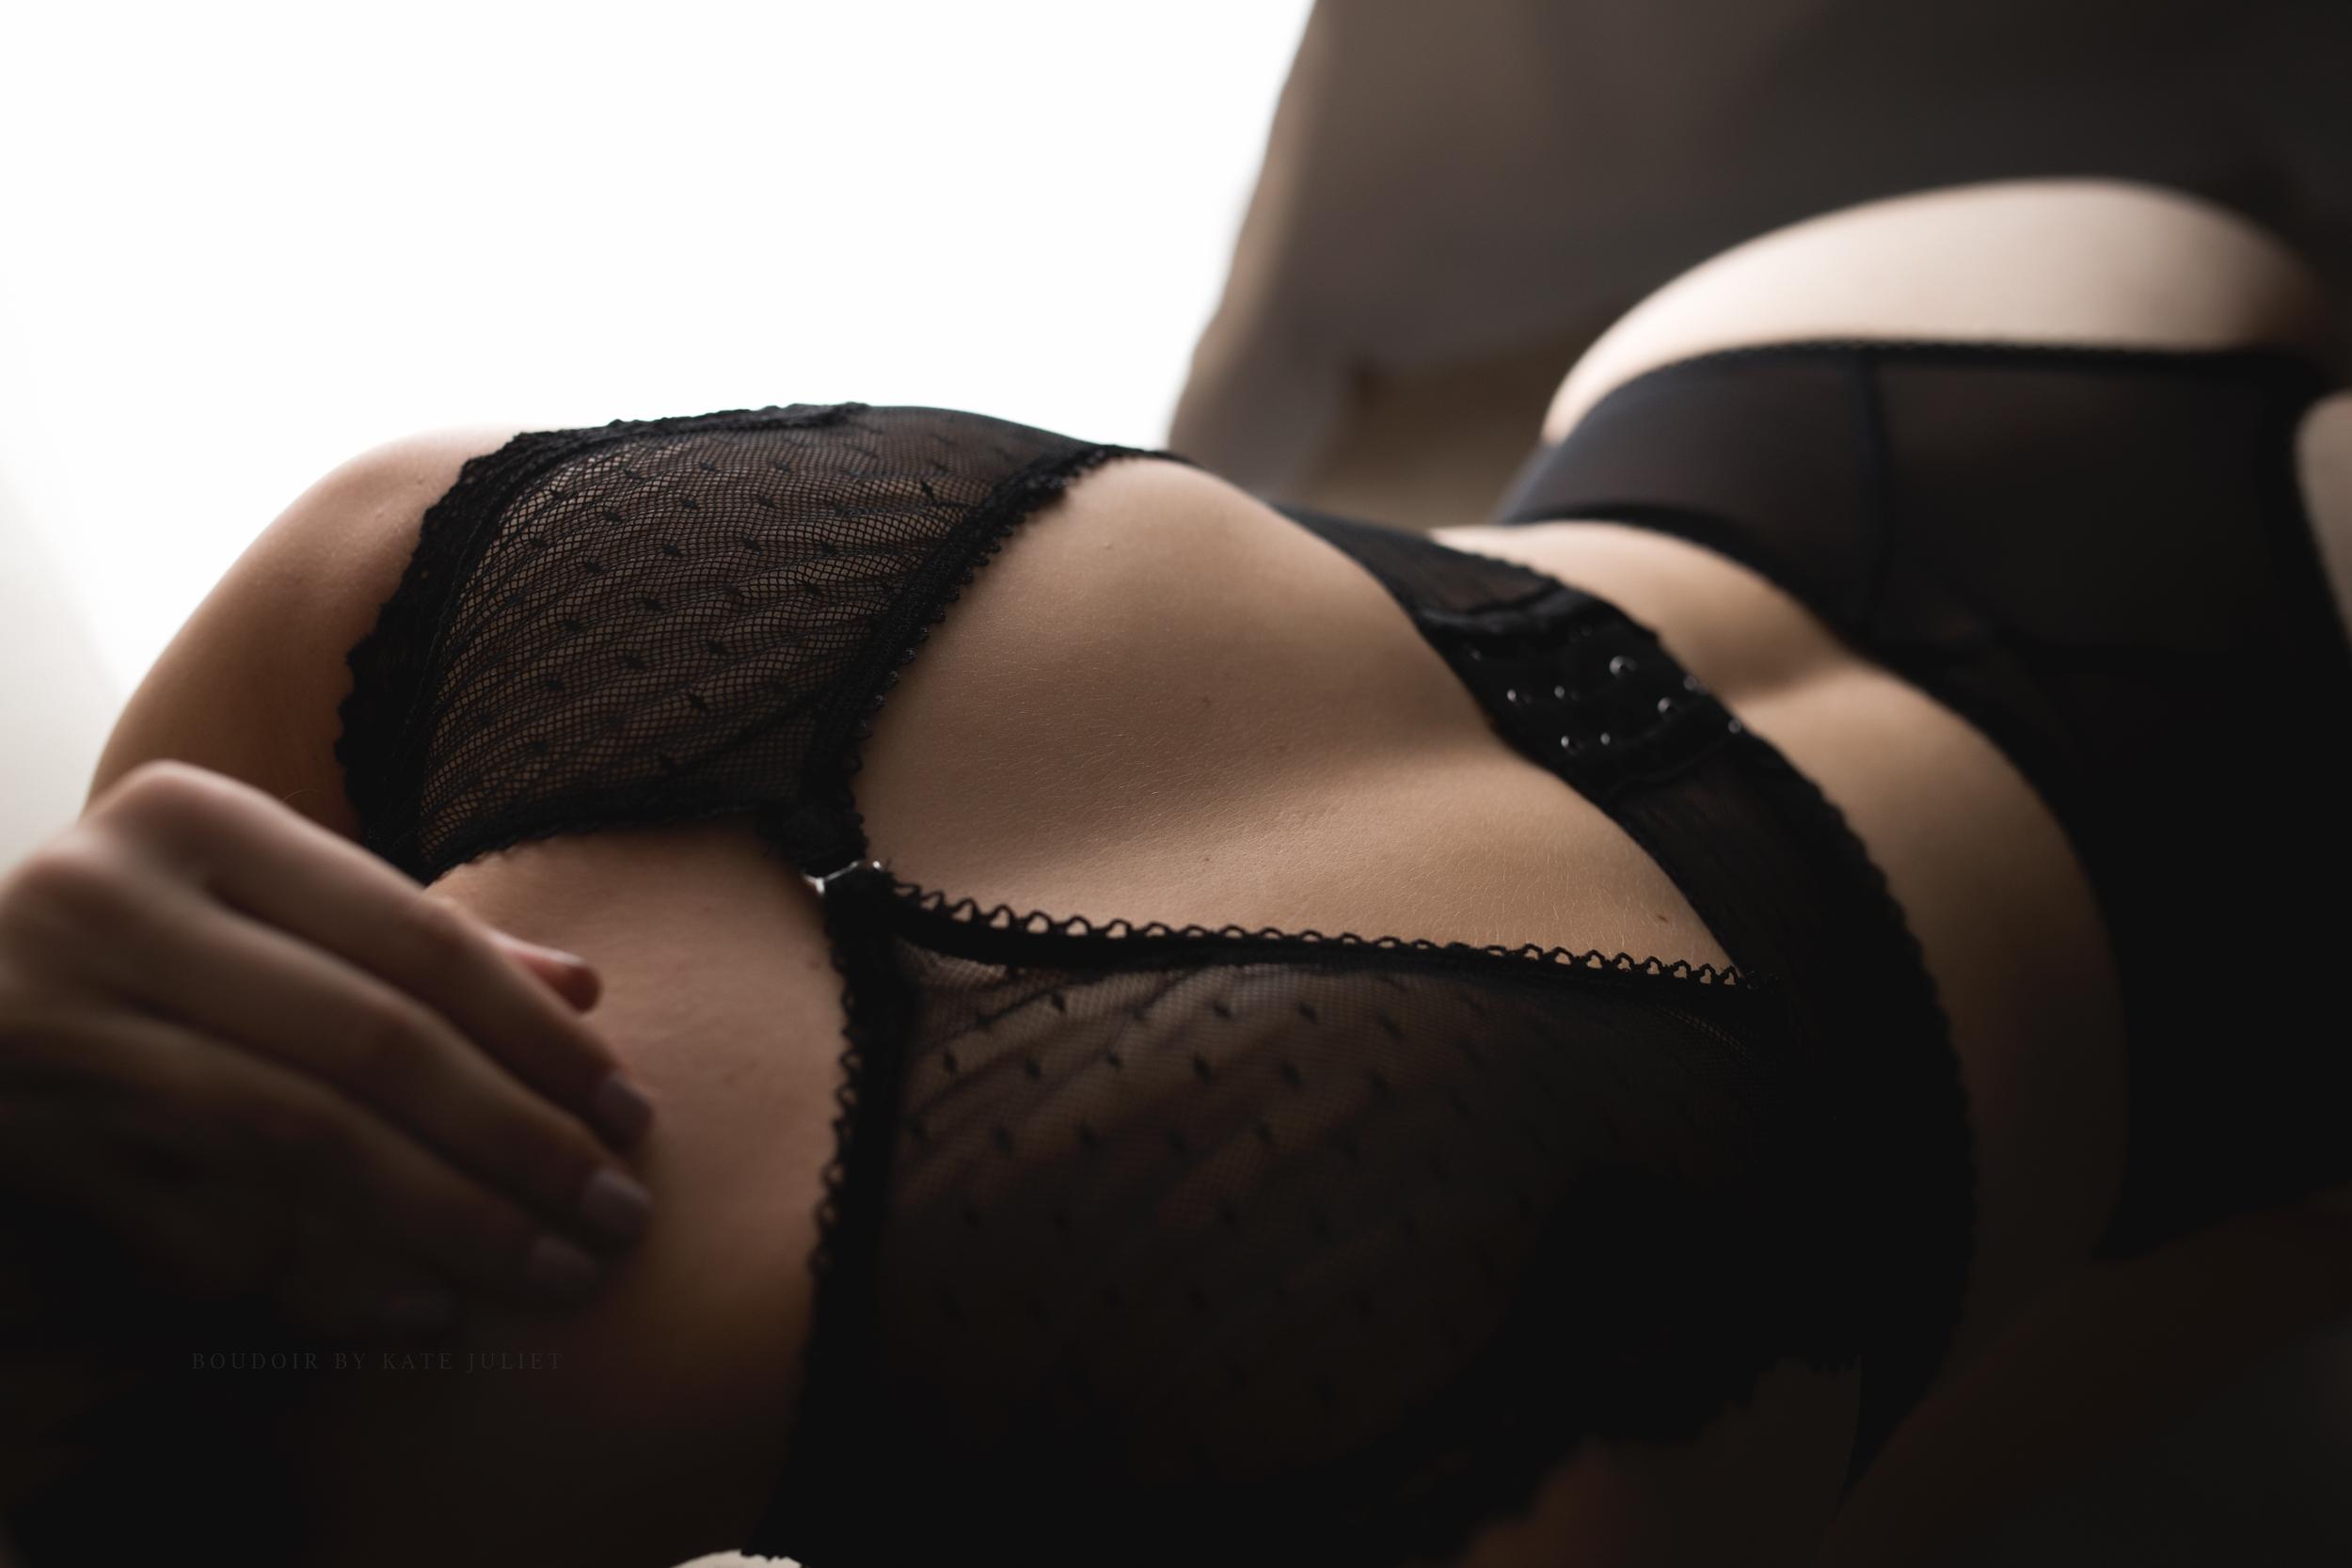 kate juliet photography - boudoir - web-103.jpg